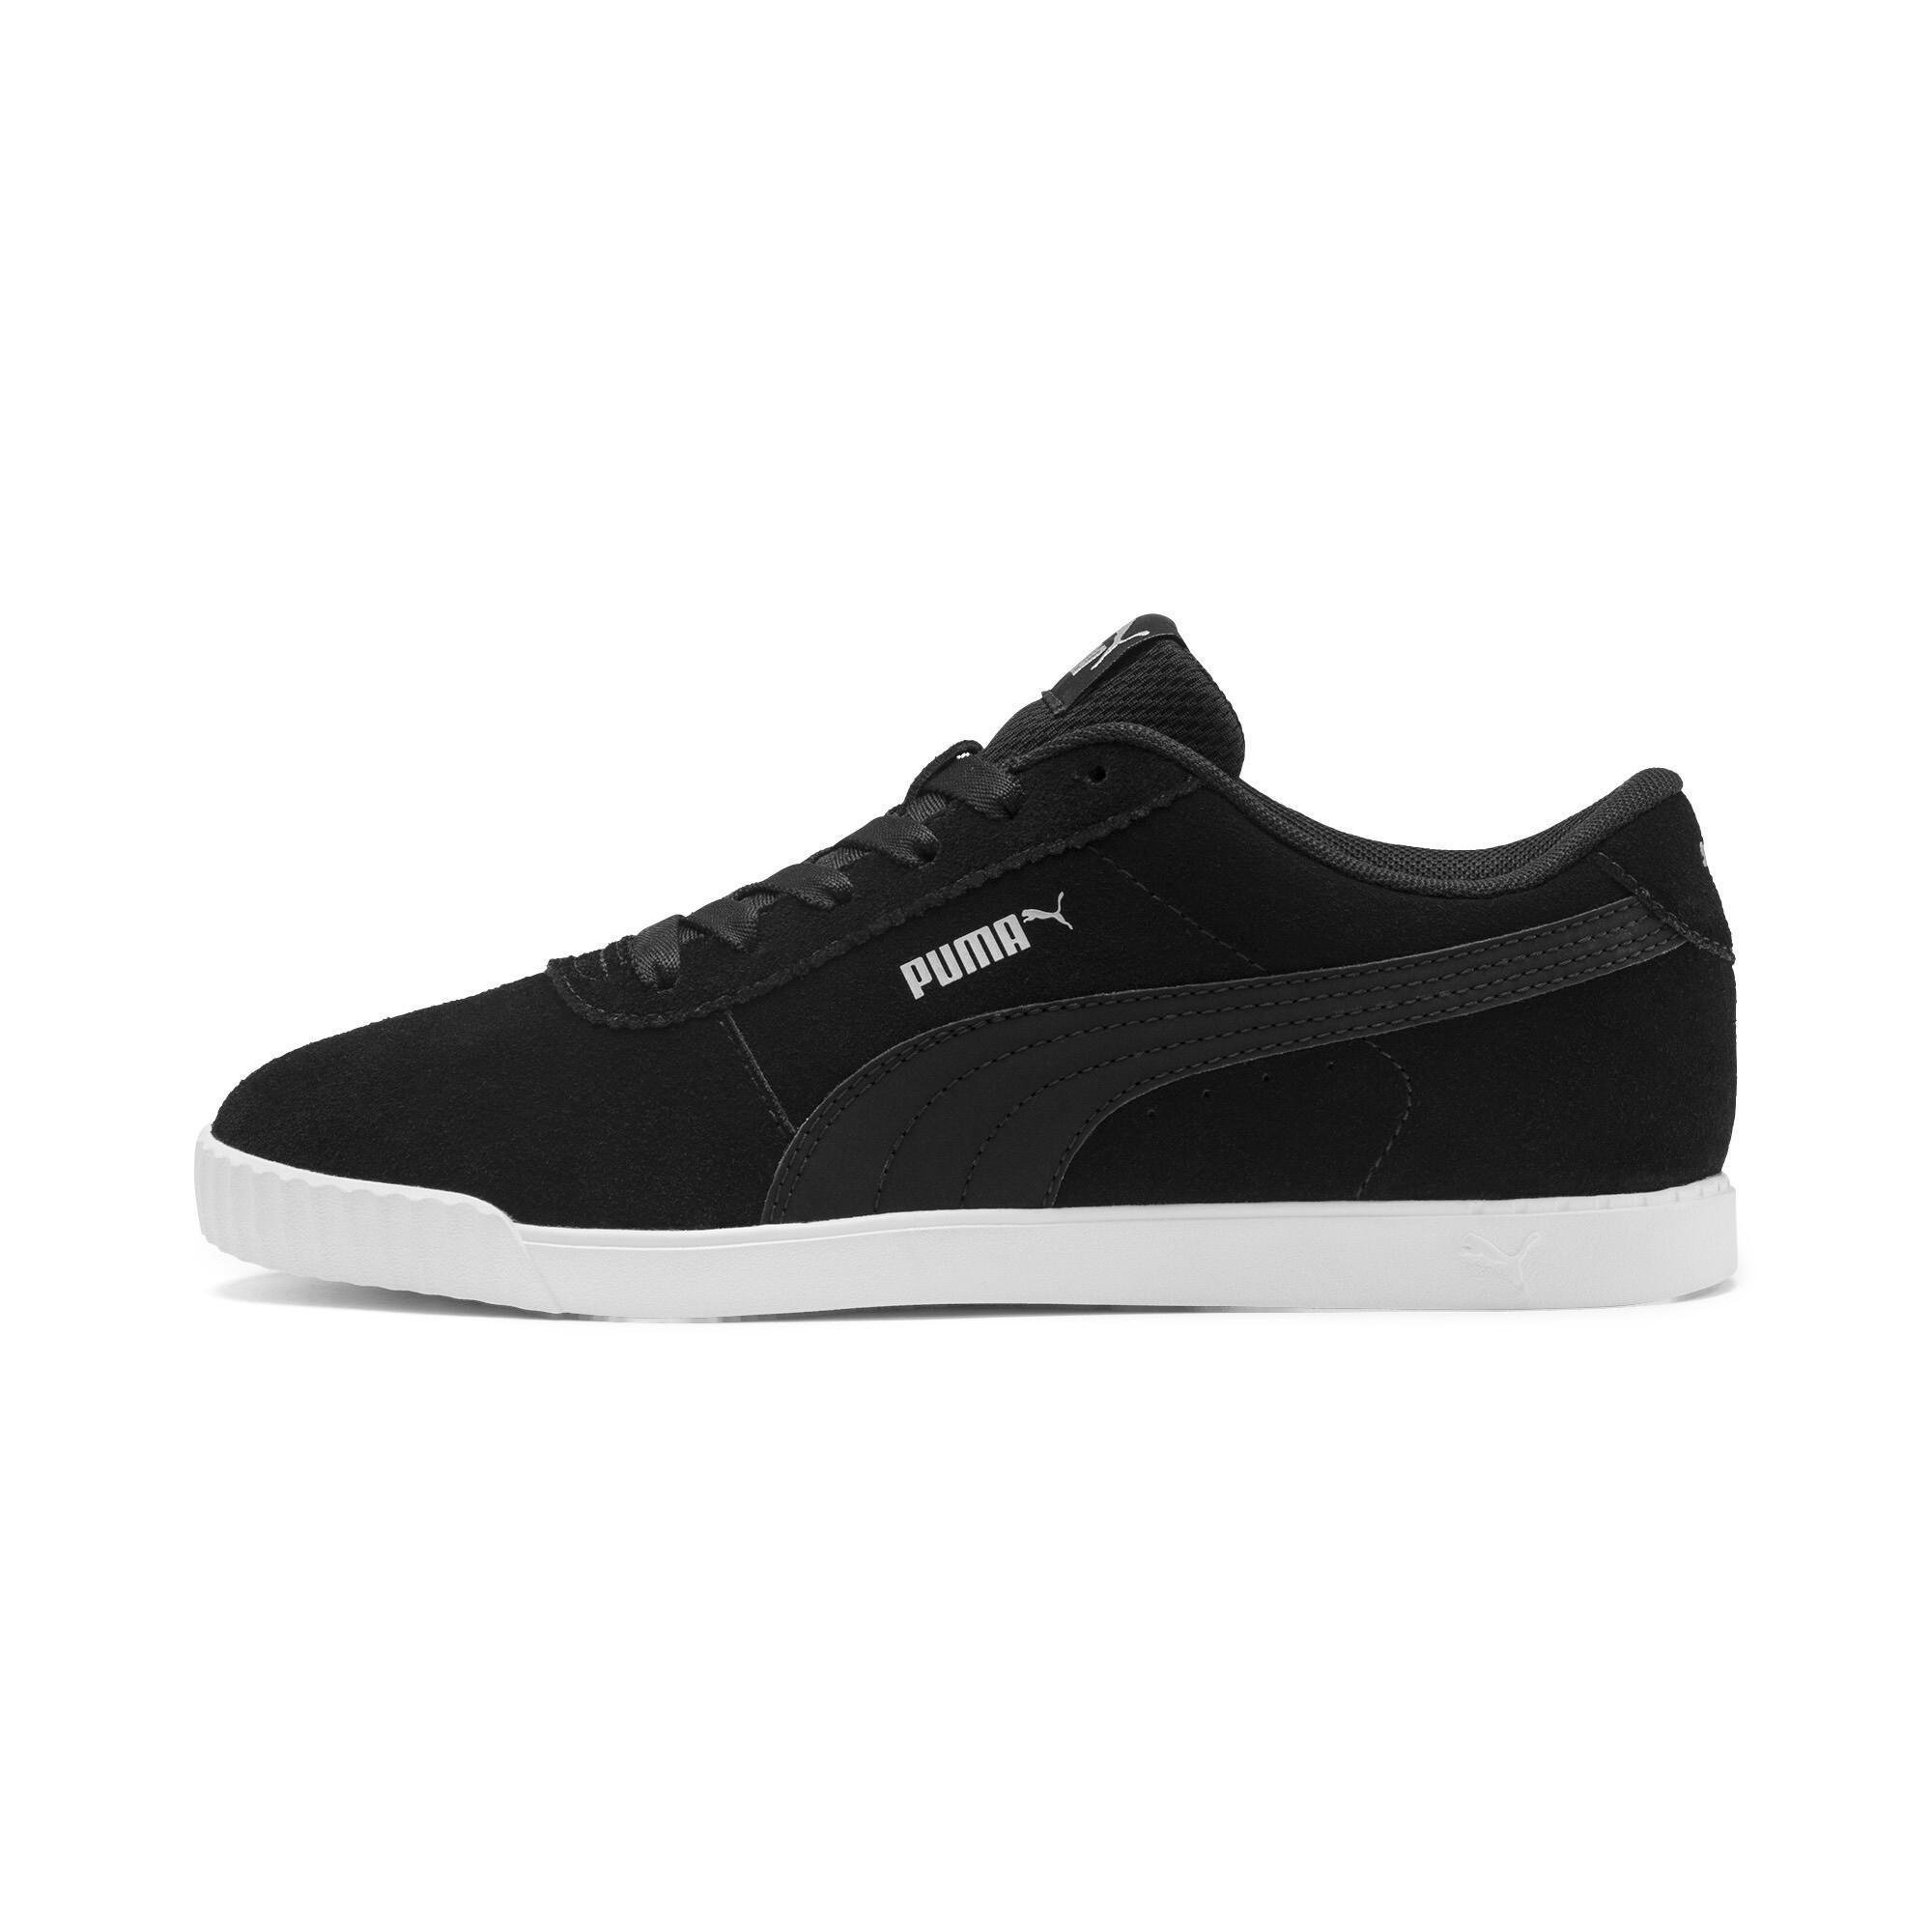 PUMA-Women-039-s-Carina-Slim-Suede-Sneakers thumbnail 18